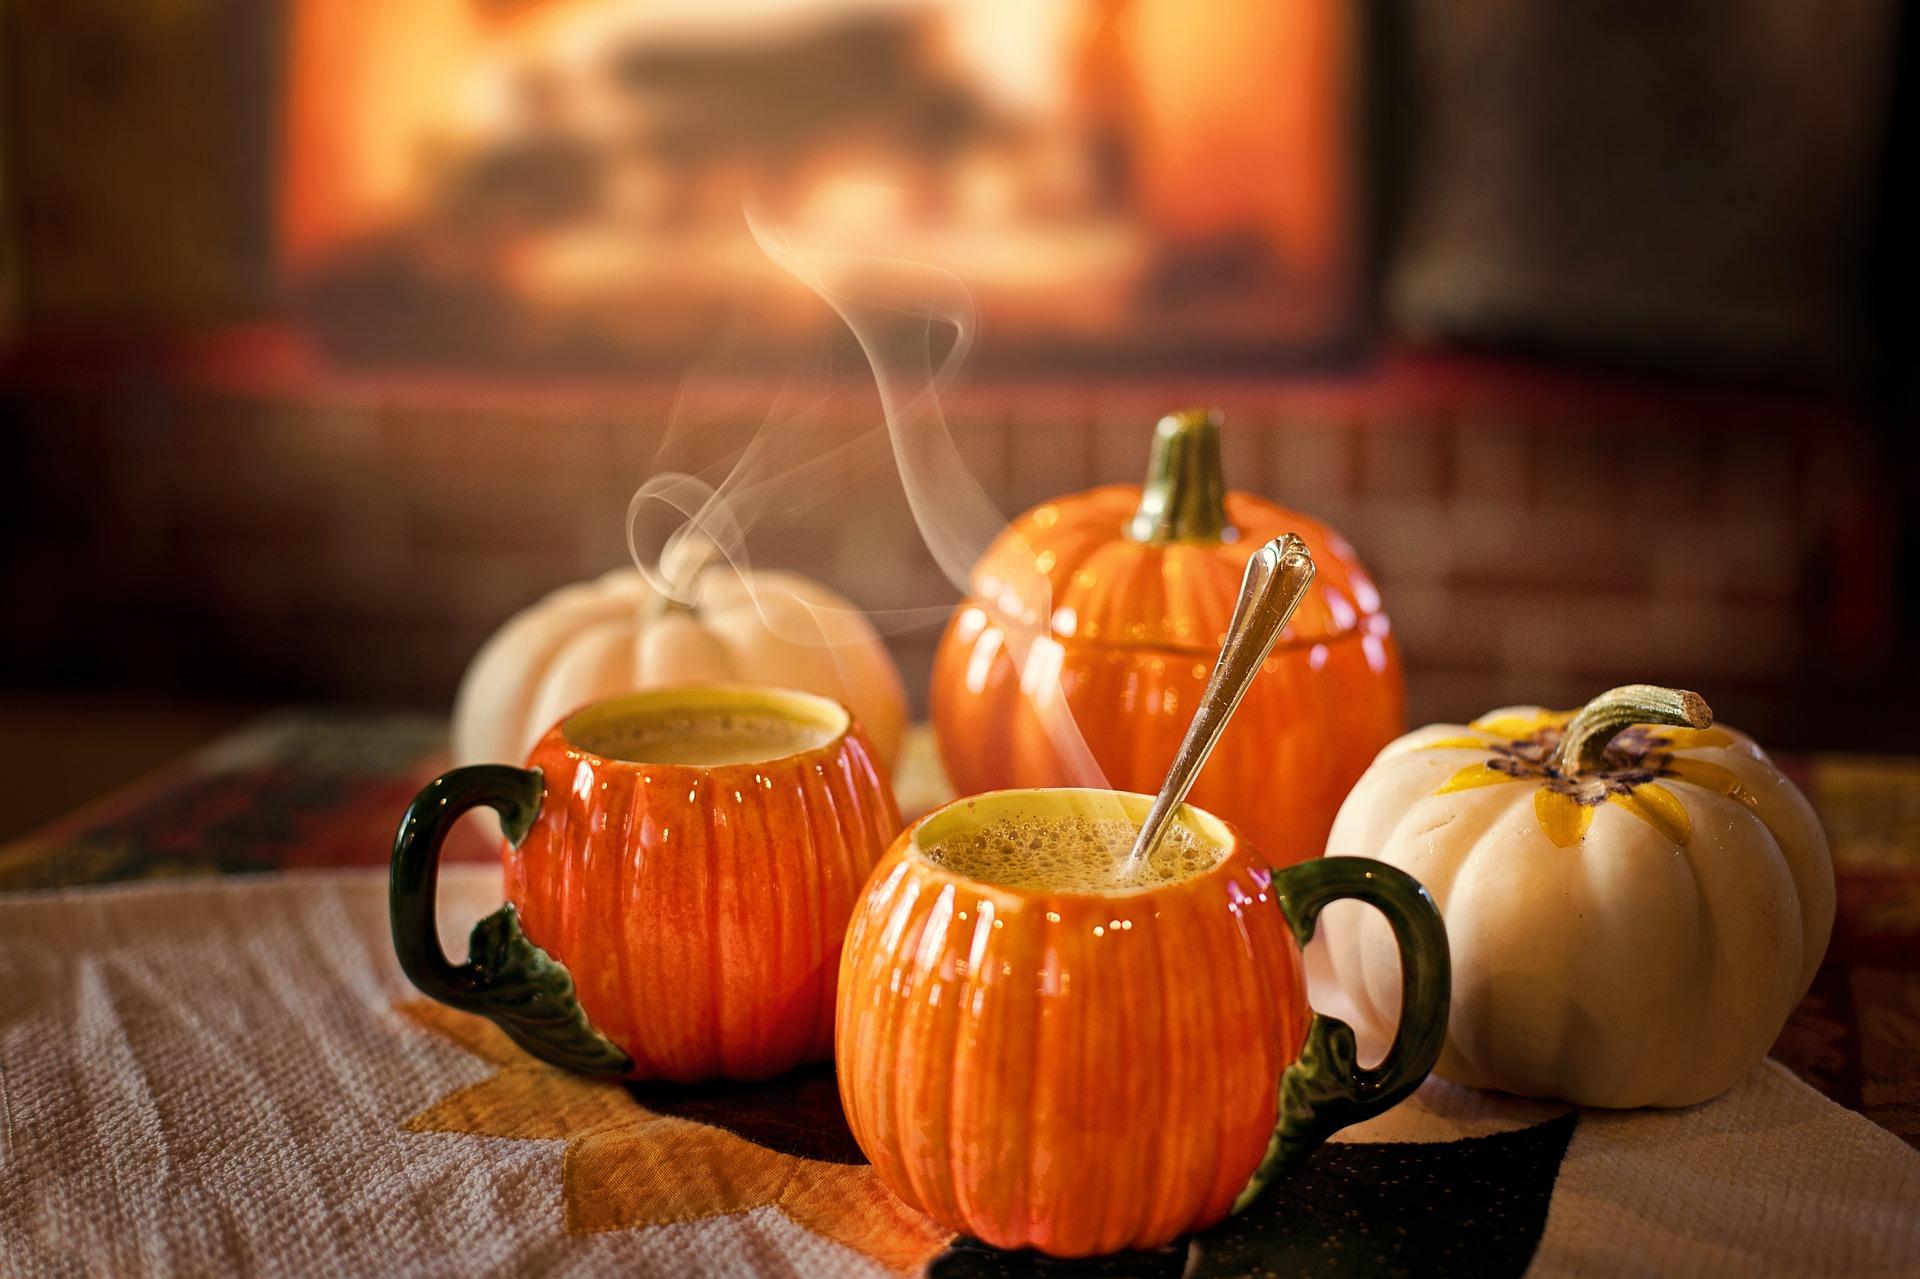 pumpkin-spice-latte-3750036_1920.jpg